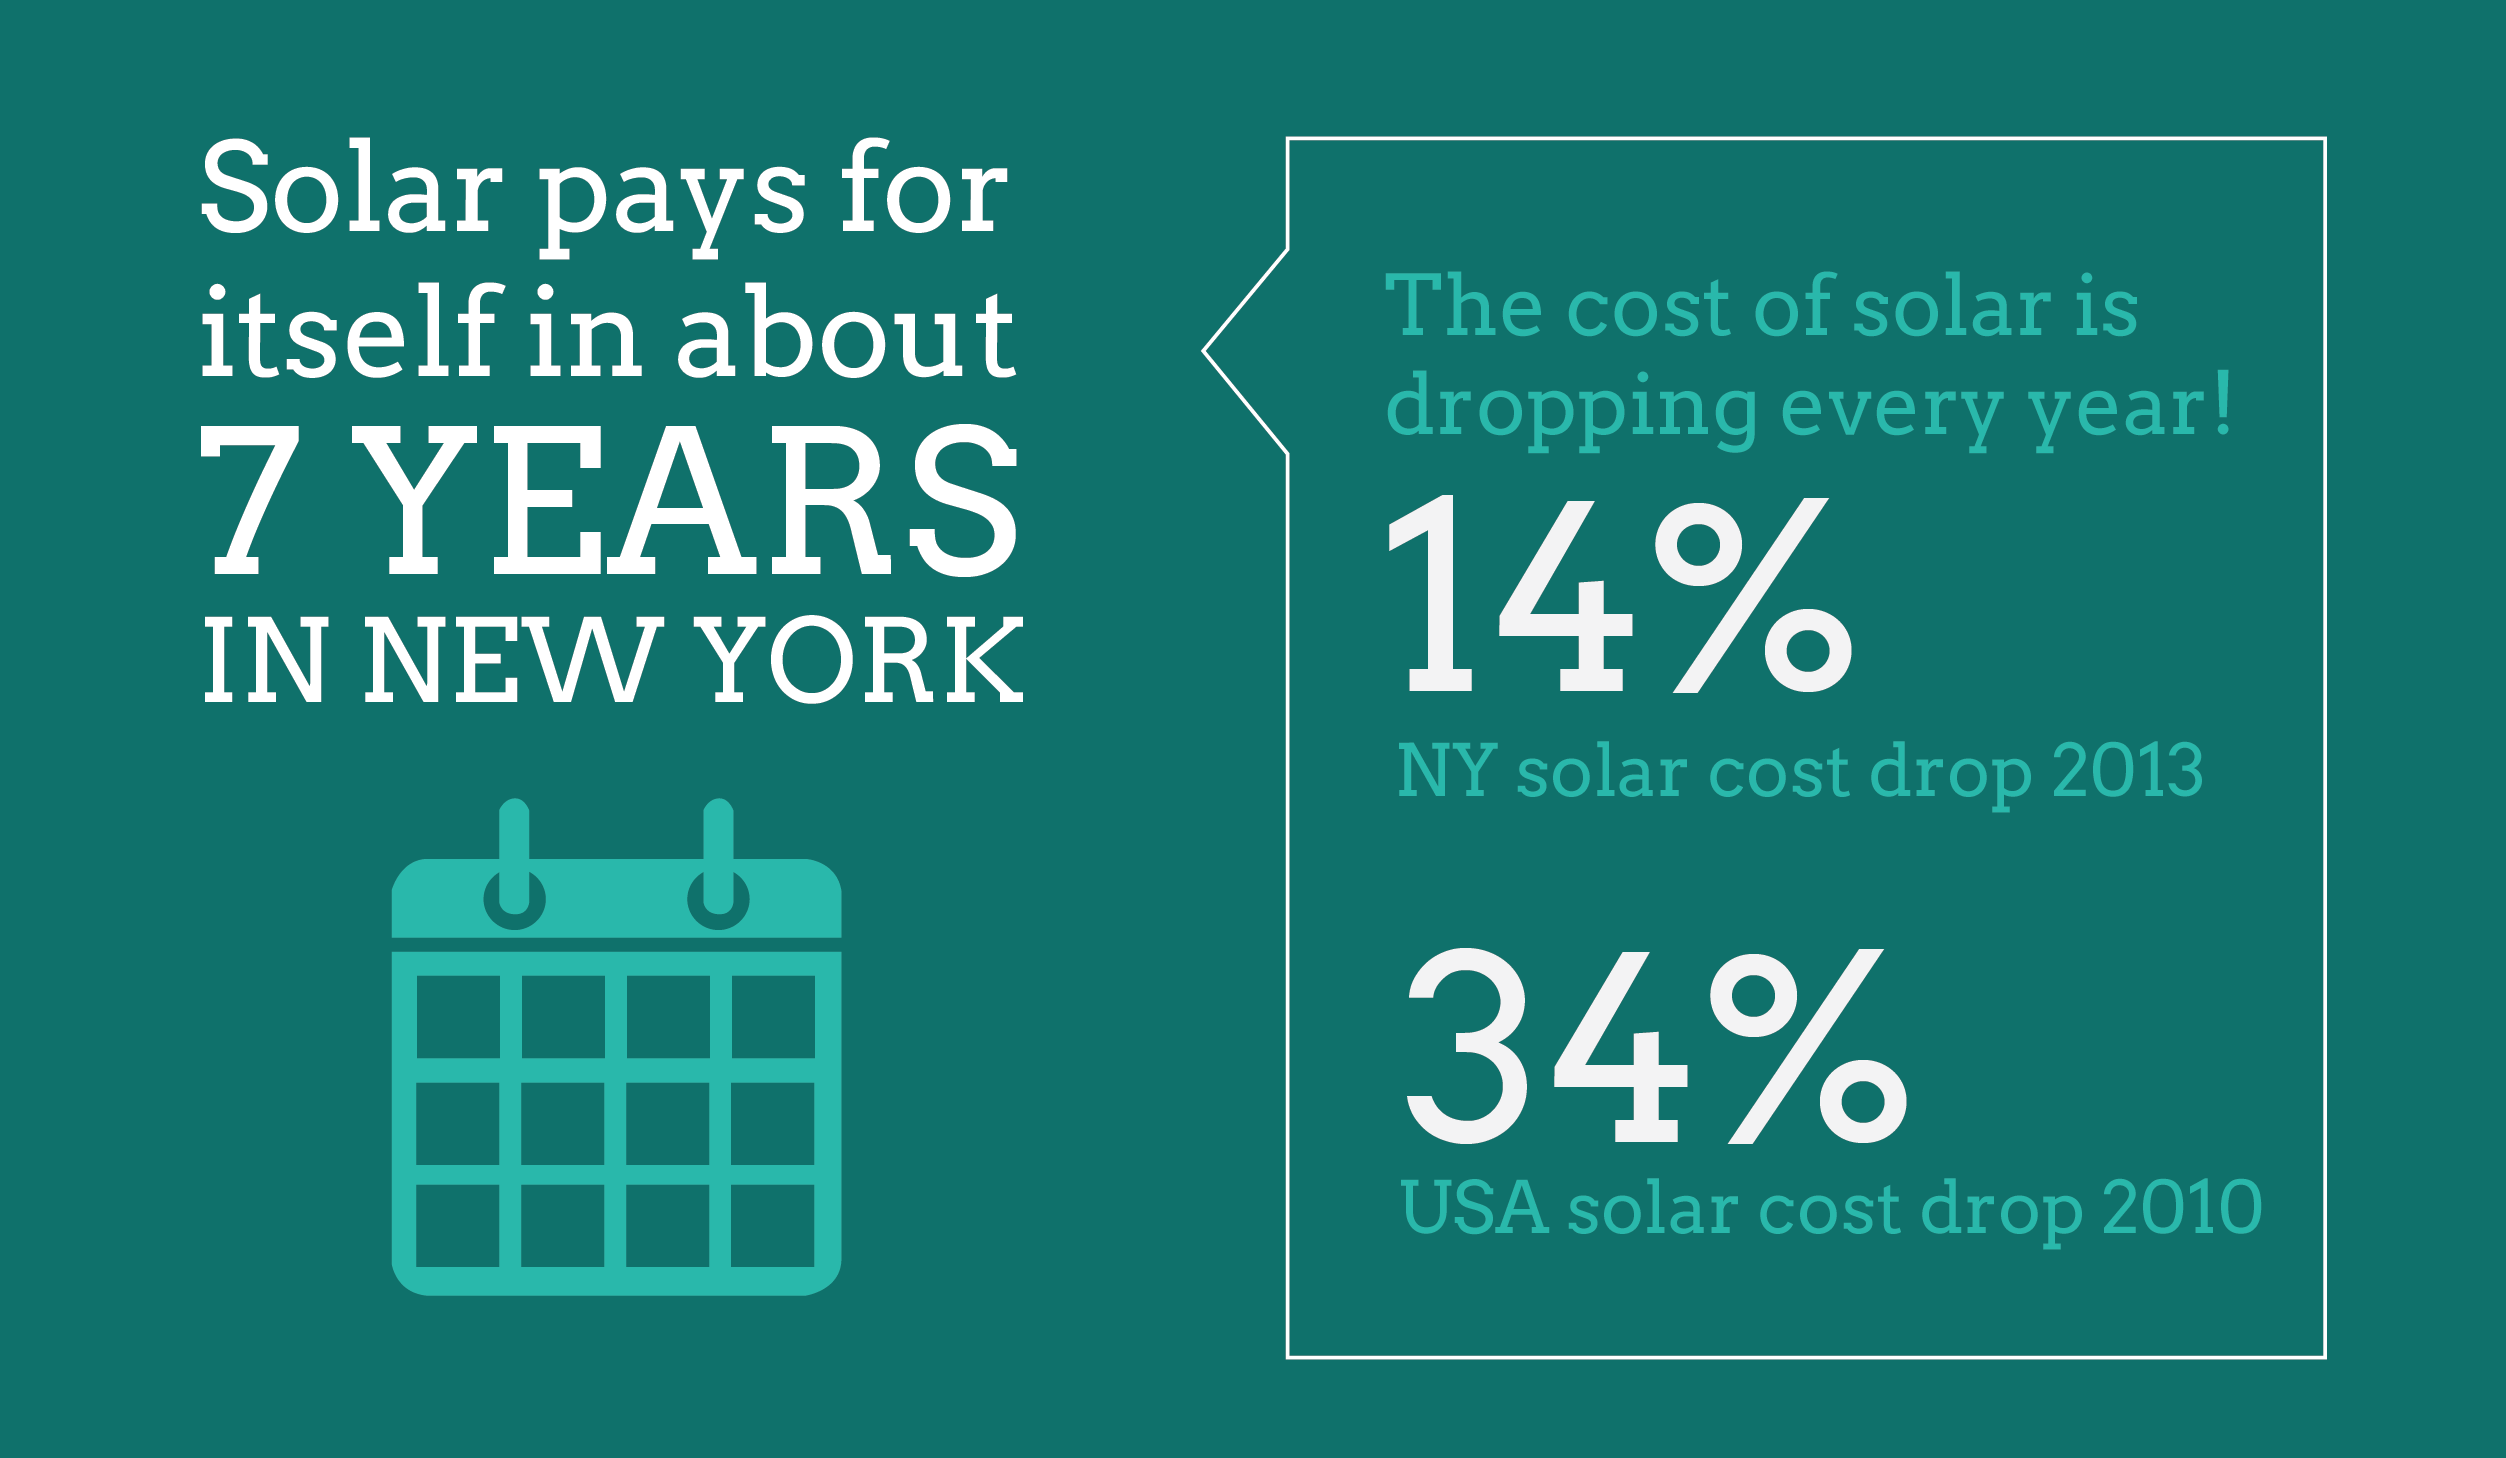 new york solar tax credit explained energysage. Black Bedroom Furniture Sets. Home Design Ideas